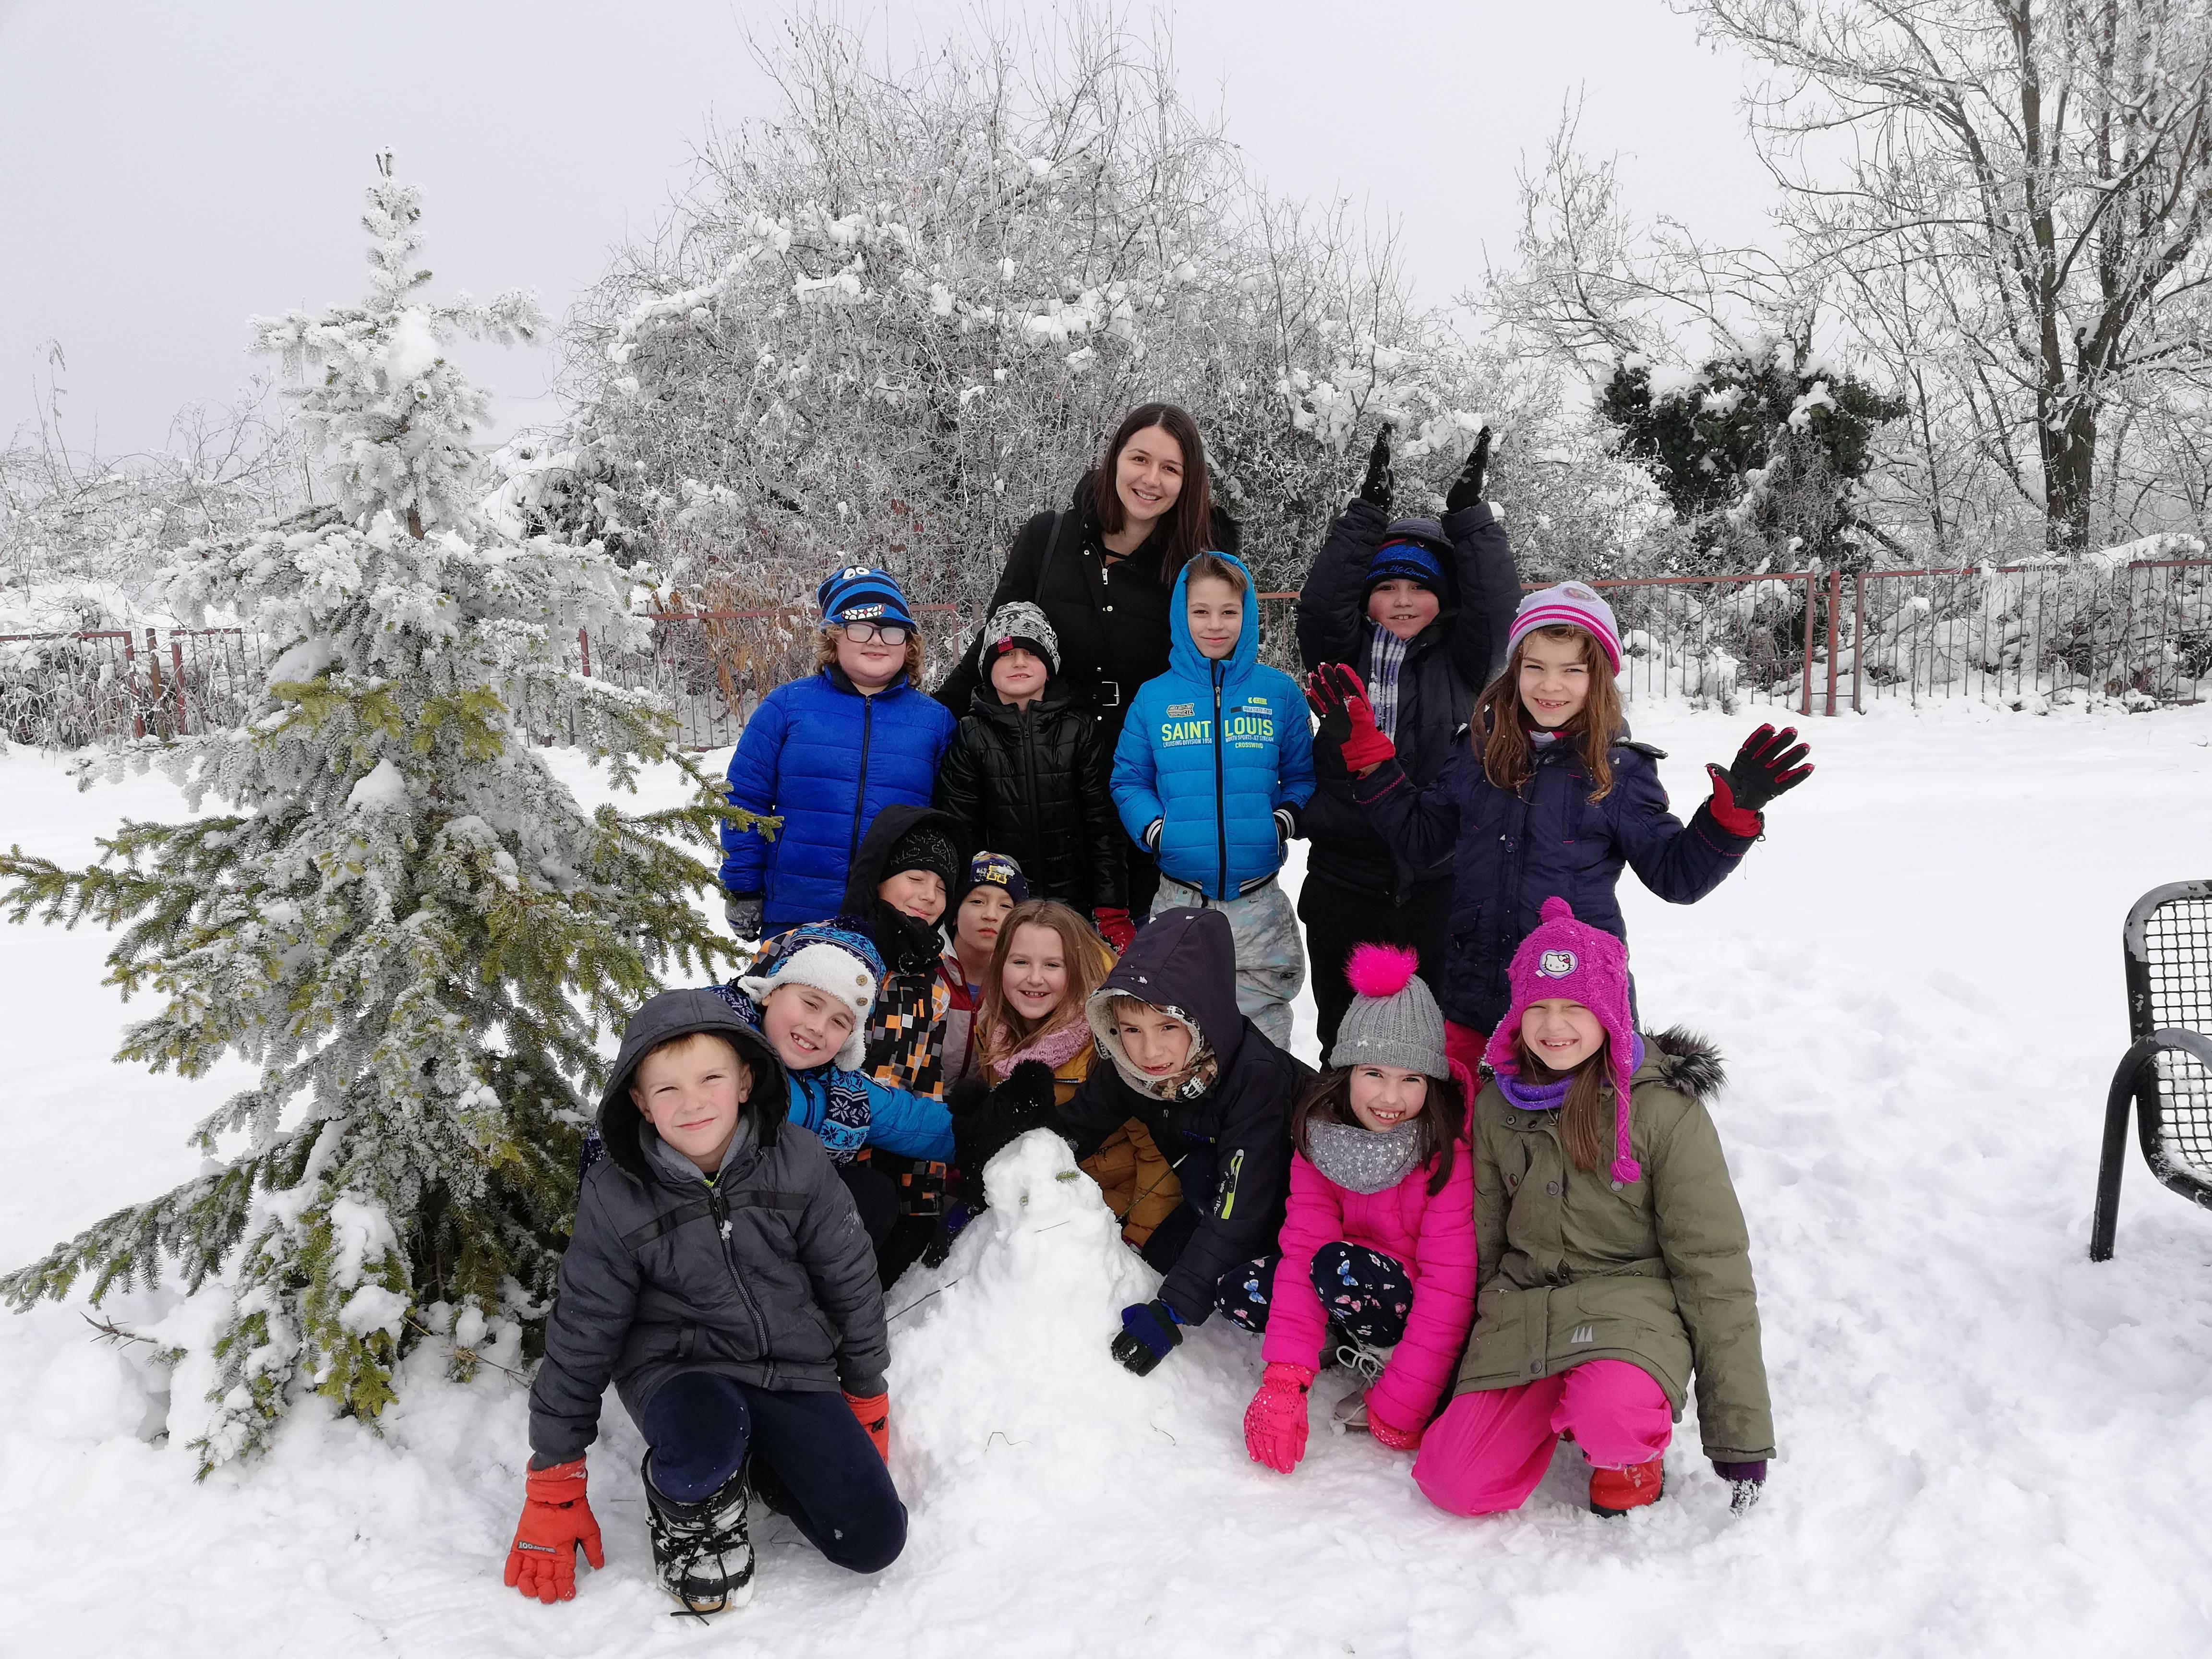 Osnovna škola Nikole Andrića - Razredne zanimljivosti drugog